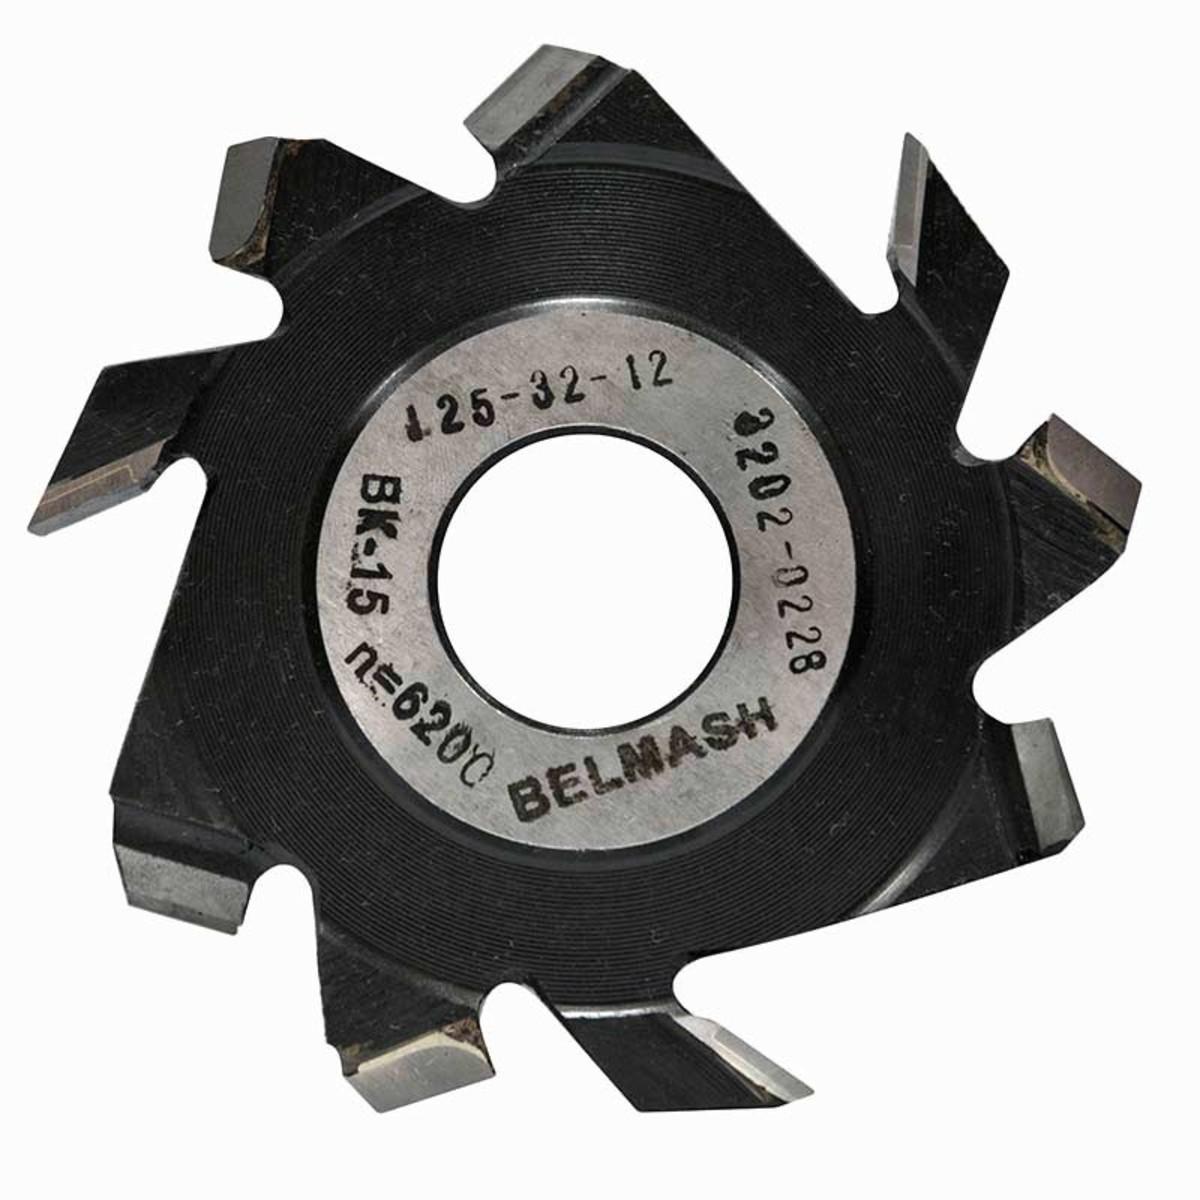 Фреза дисковая пазовая по дереву BELMASH 125x32x12 мм с подрезающими зубьями 9 зубьев